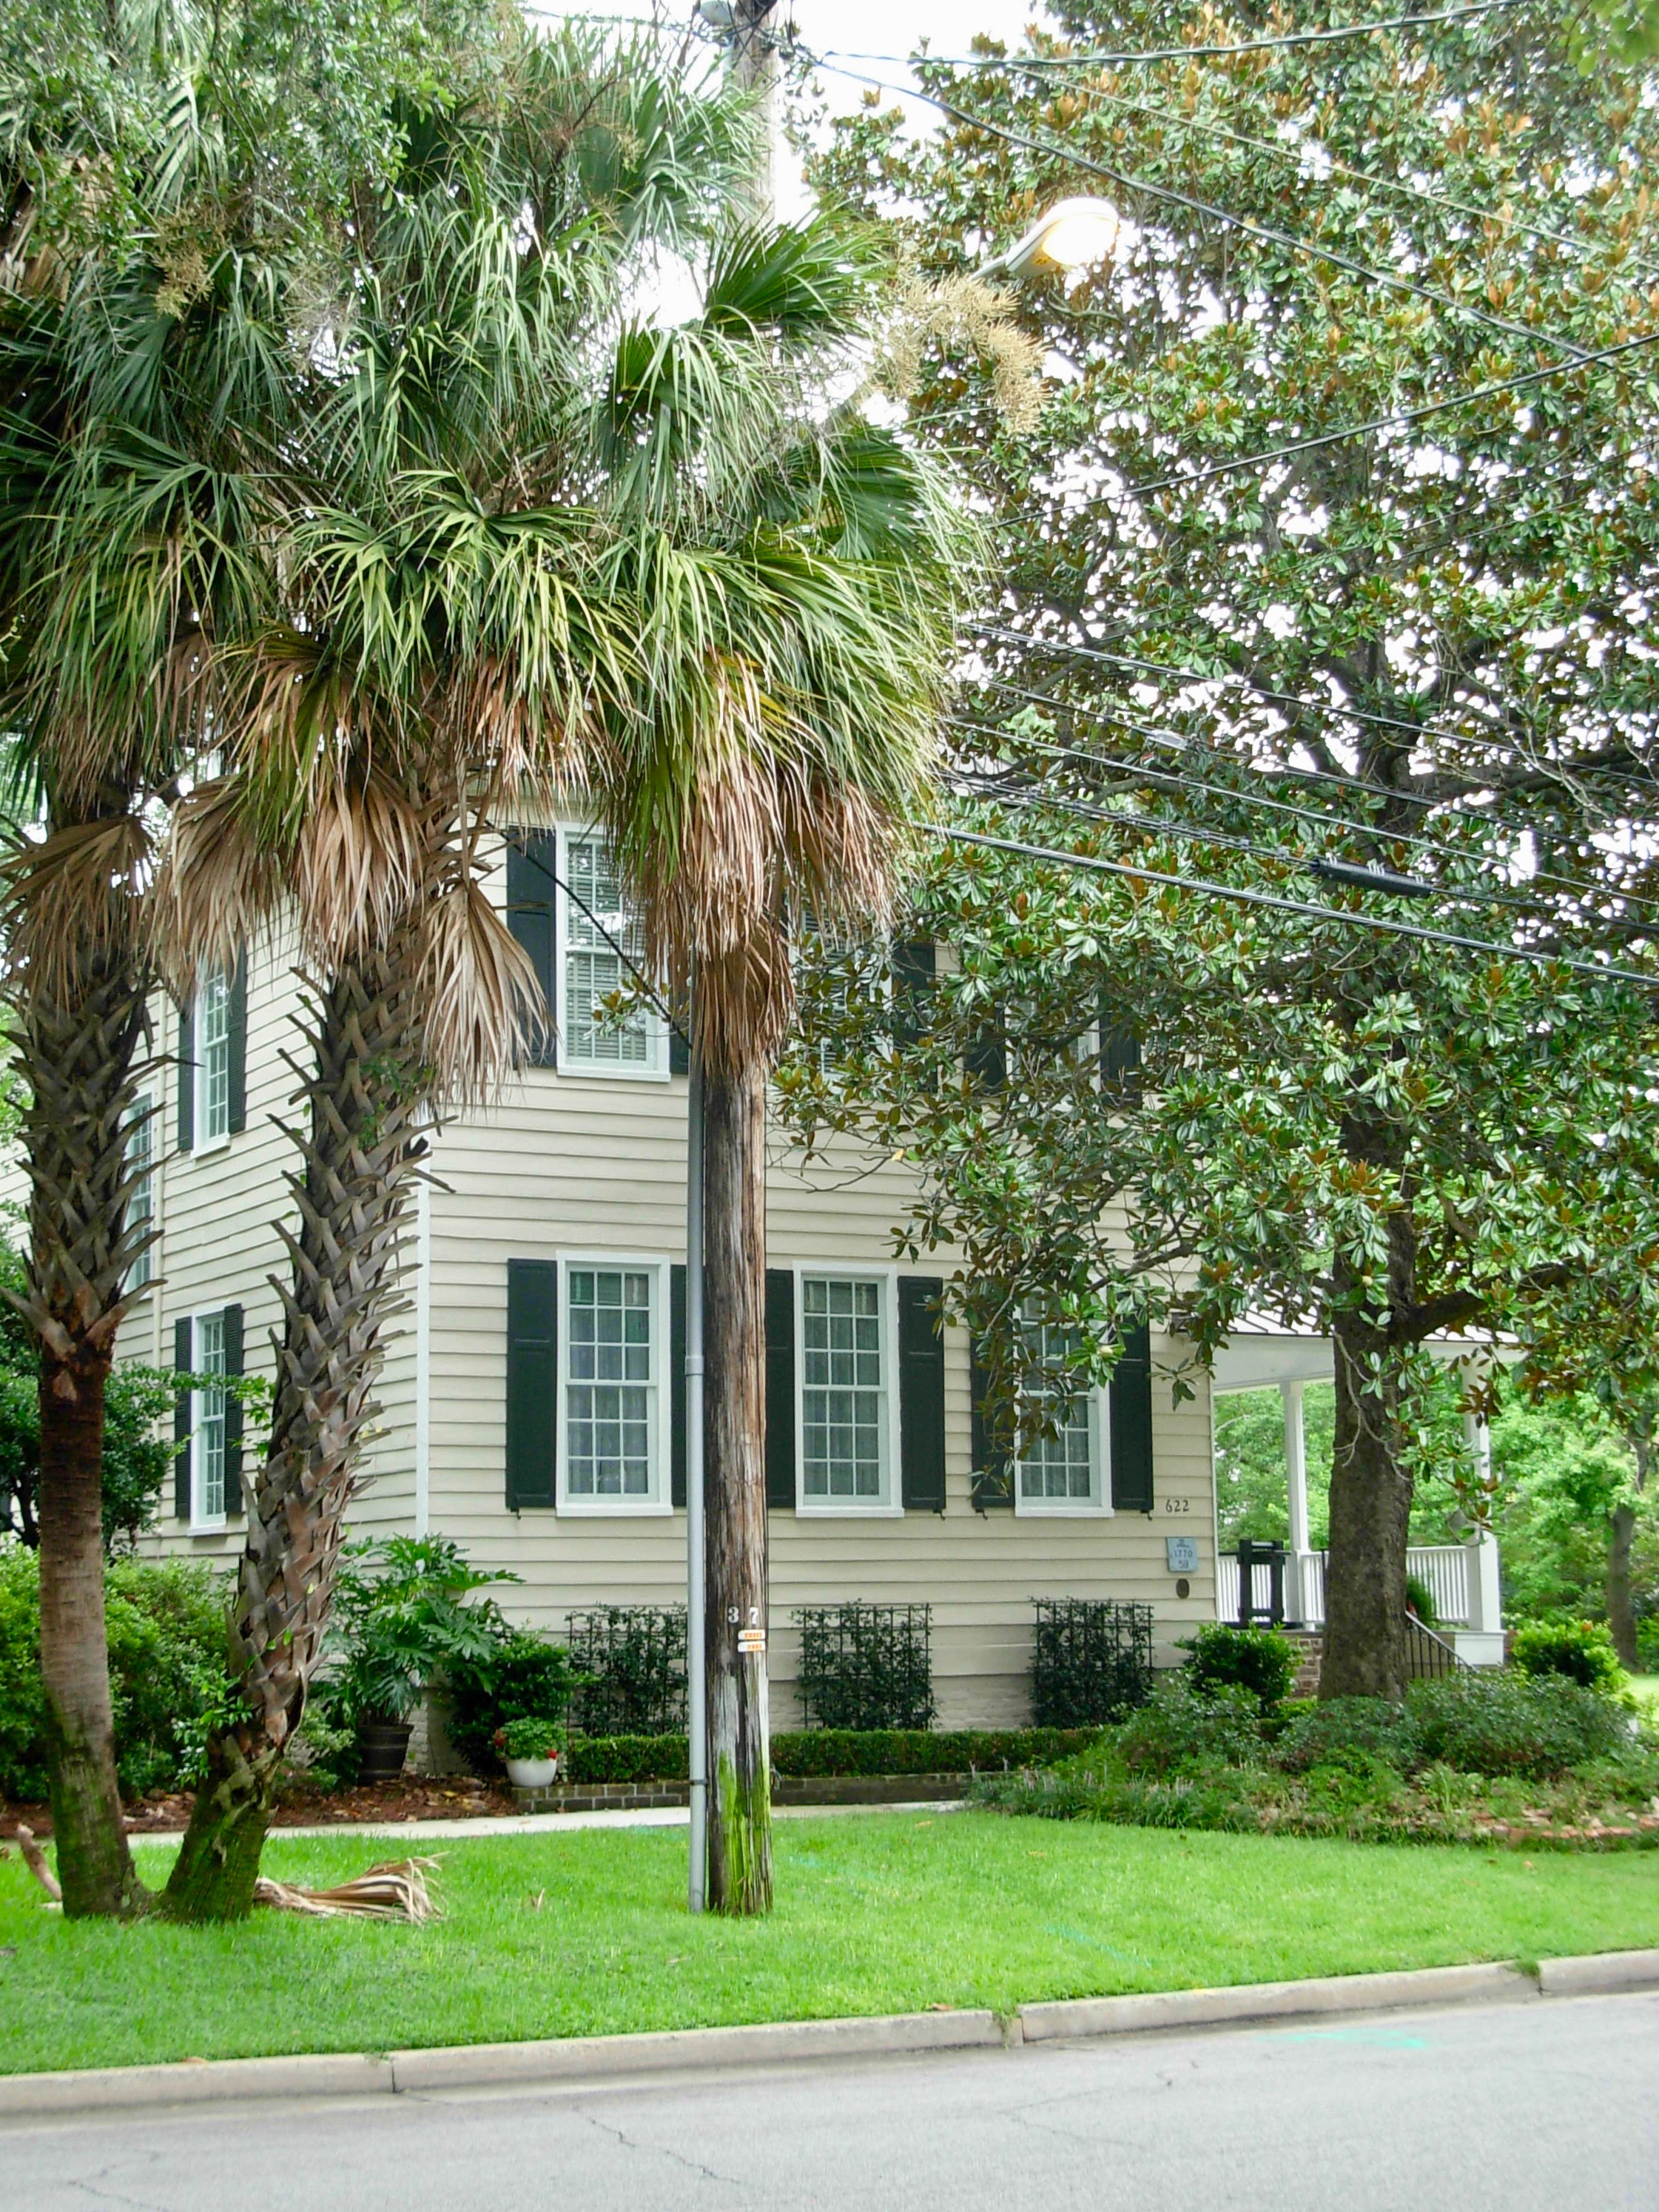 Waterman-Kaminski House Georgetown South Carolina ghosts haunted